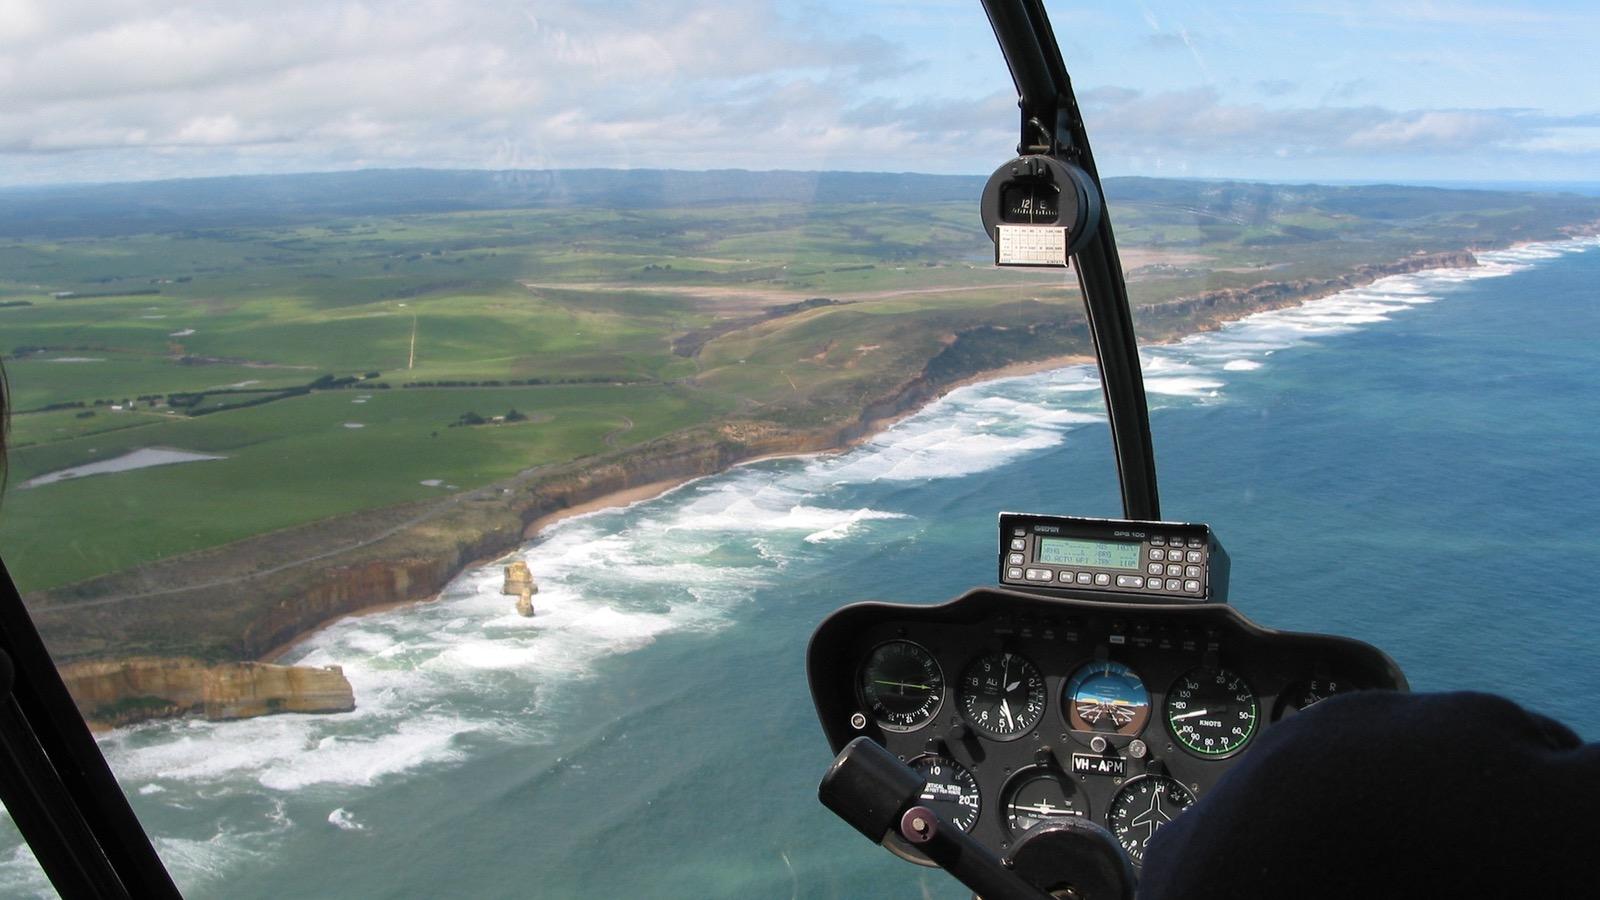 Shipwreck Coast Helicopter Flight